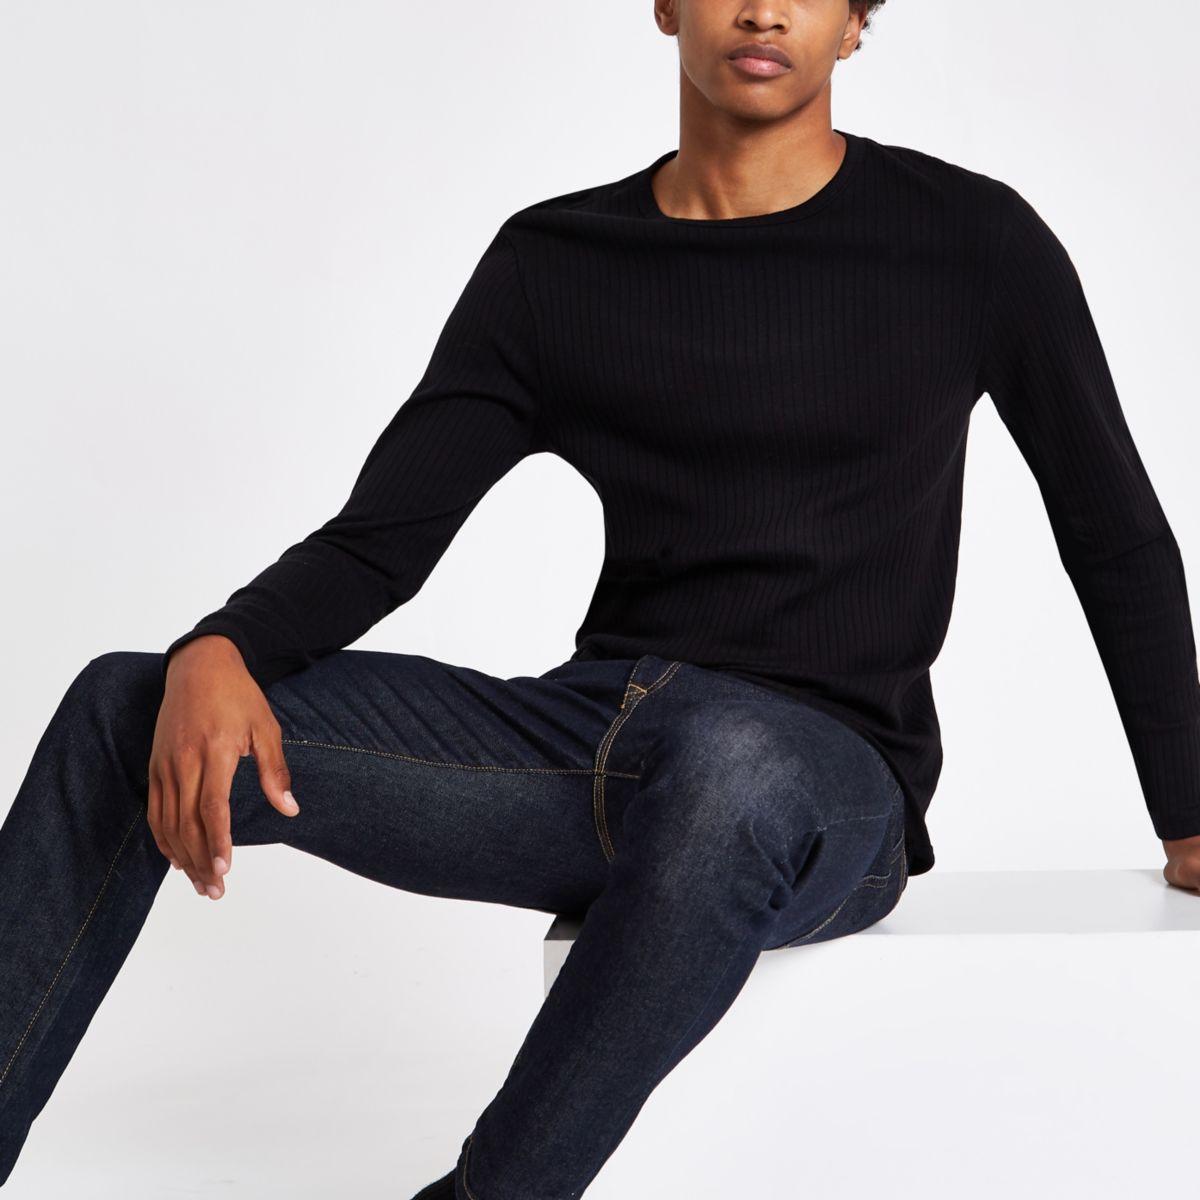 Schwarzes, langärmliges Slim Fit T-Shirt